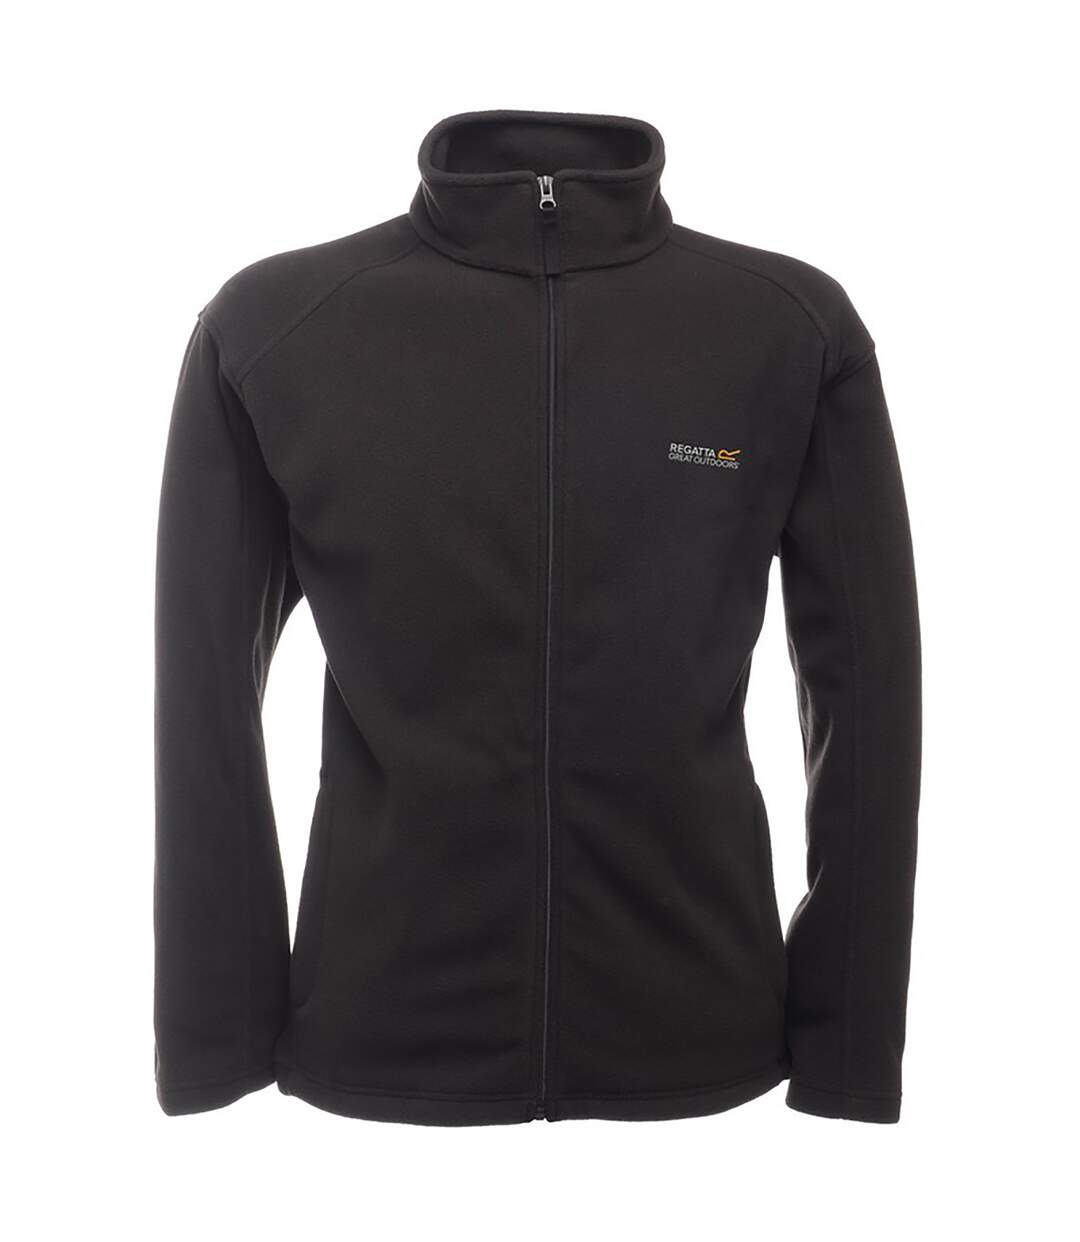 Regatta Great Outdoors Mens Hedman II Two Tone Full Zip Fleece Jacket (Black/Black) - UTRG1398